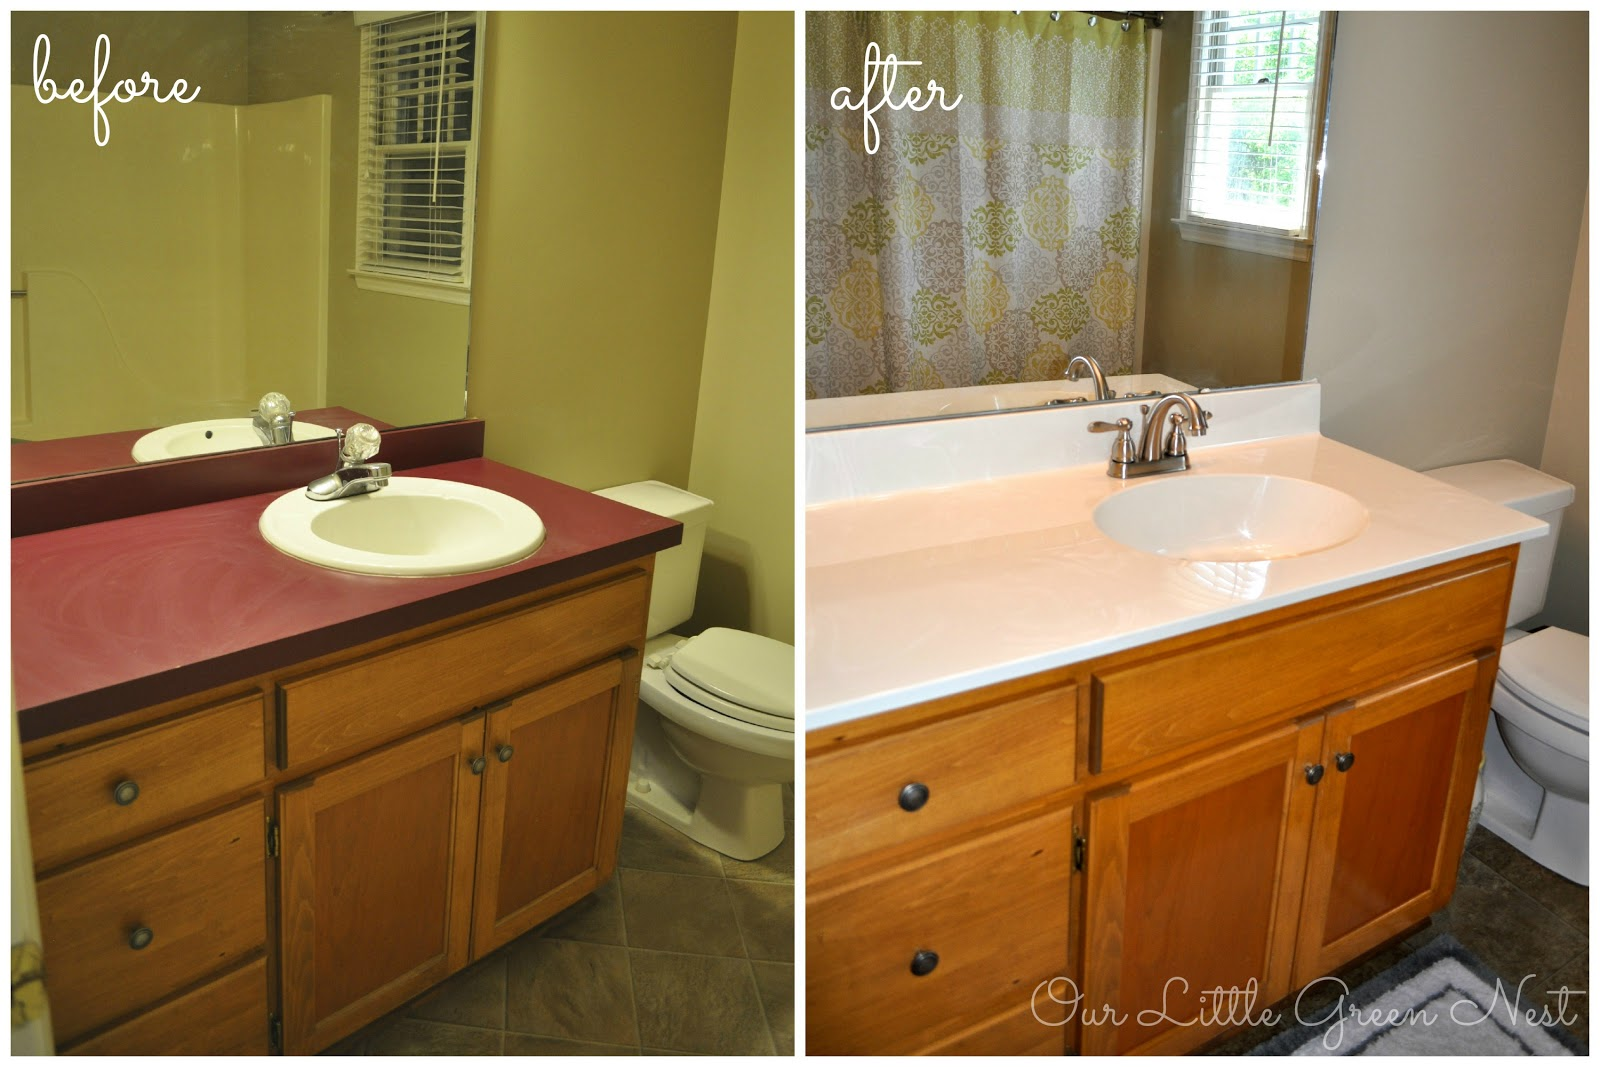 Natural Stone And Laminate Kitchen Bath Countertops Burgundy Laminate Countertop Dark Brown Hairs